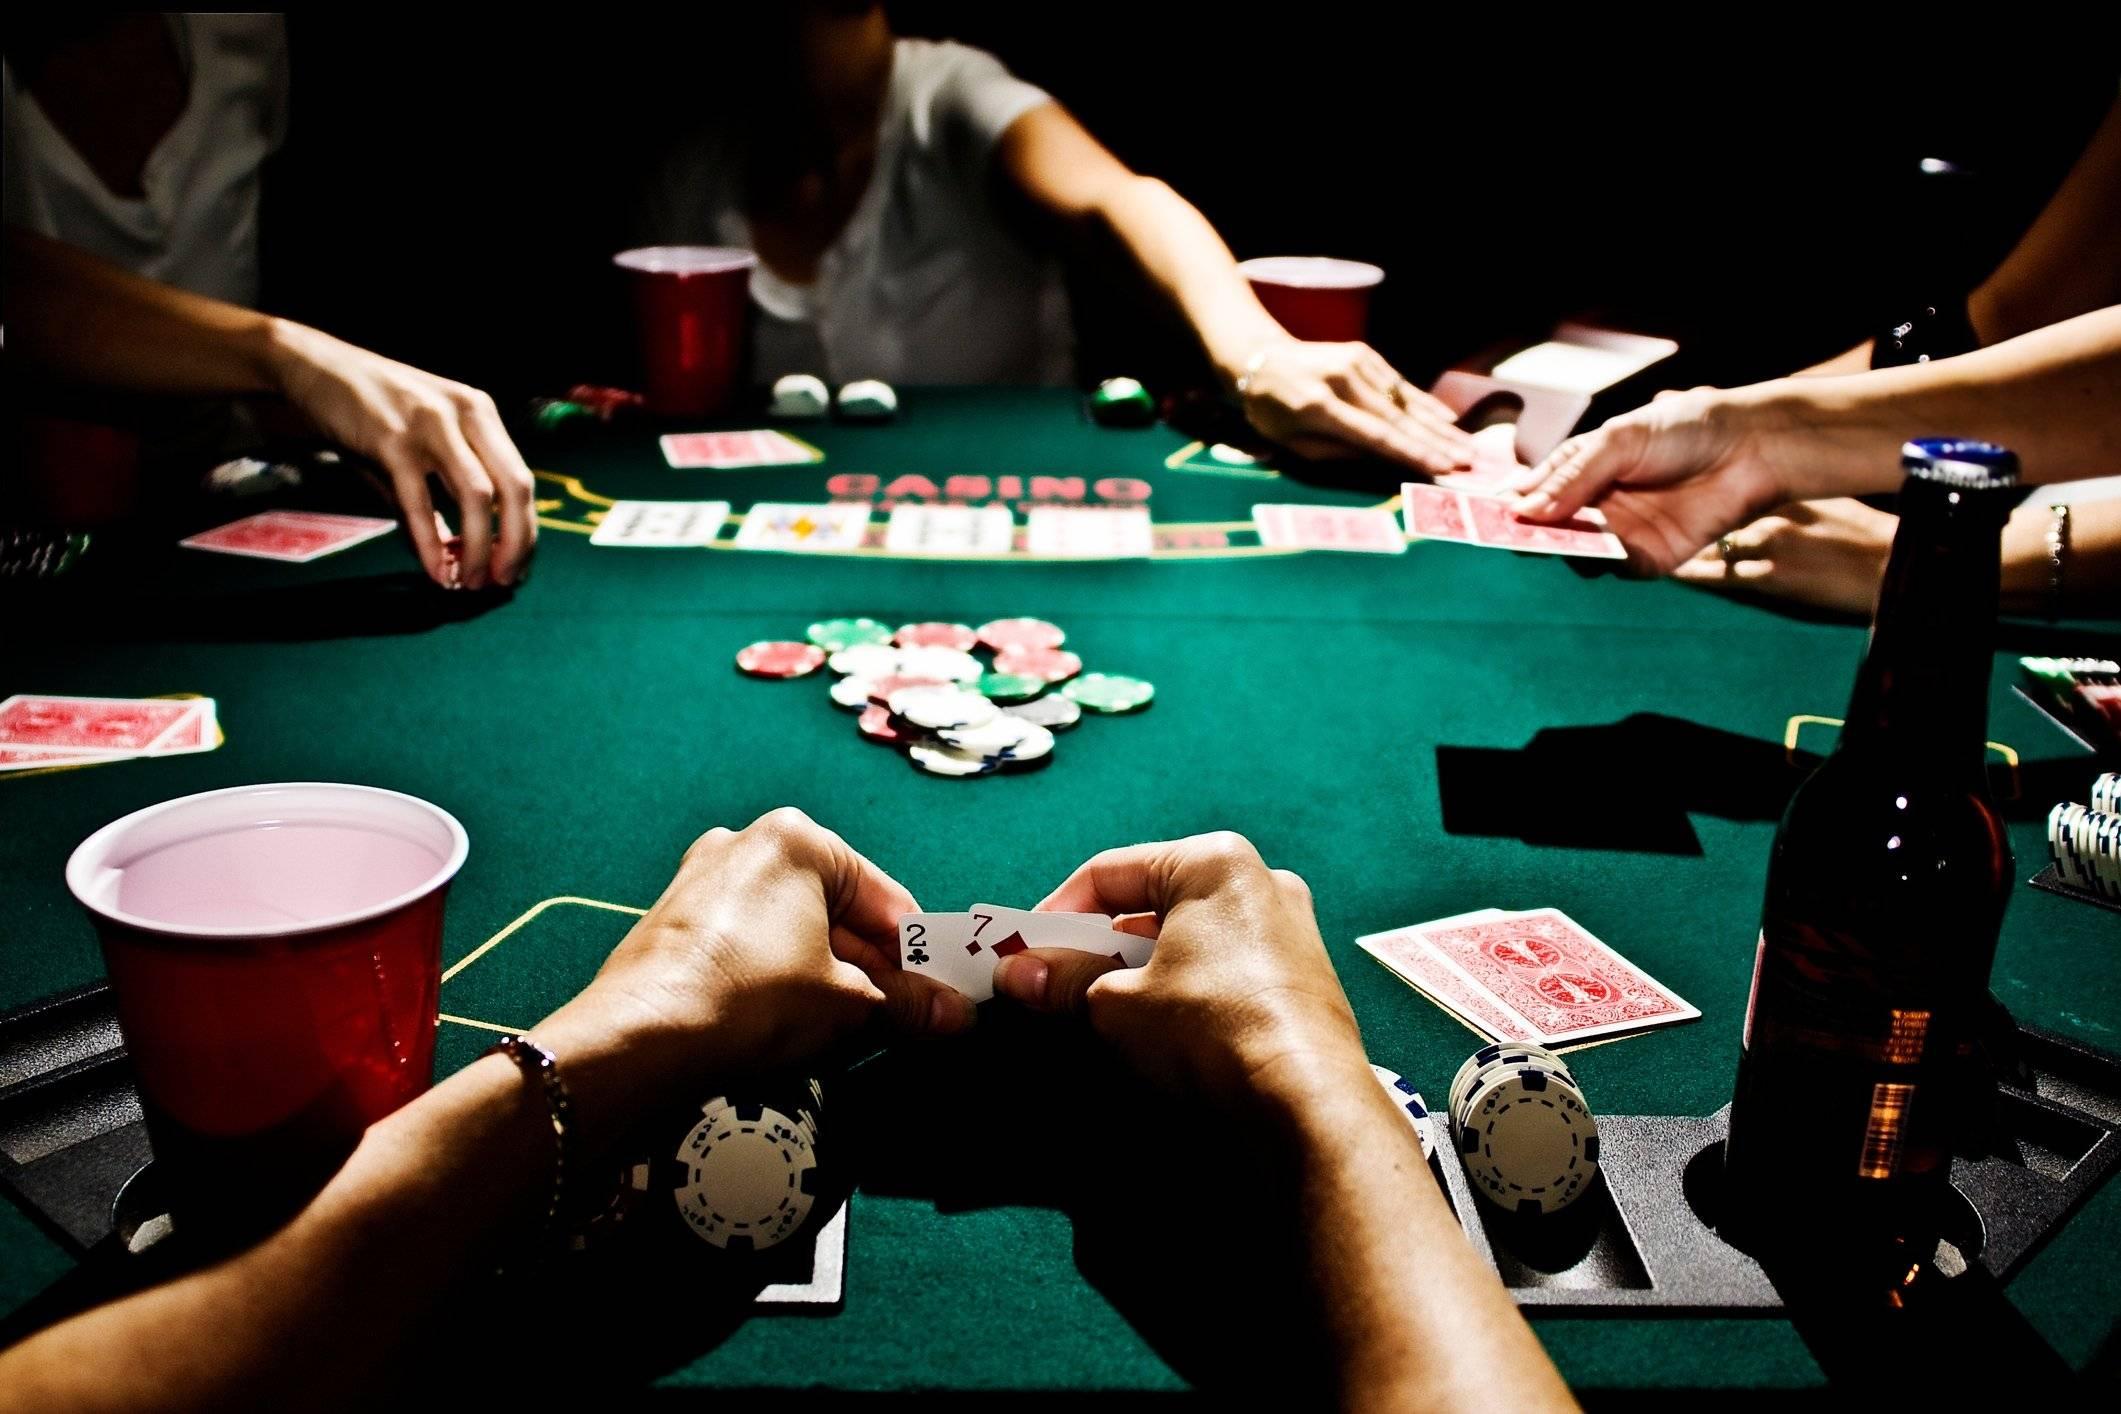 Organizing the Ultimate Poker Night